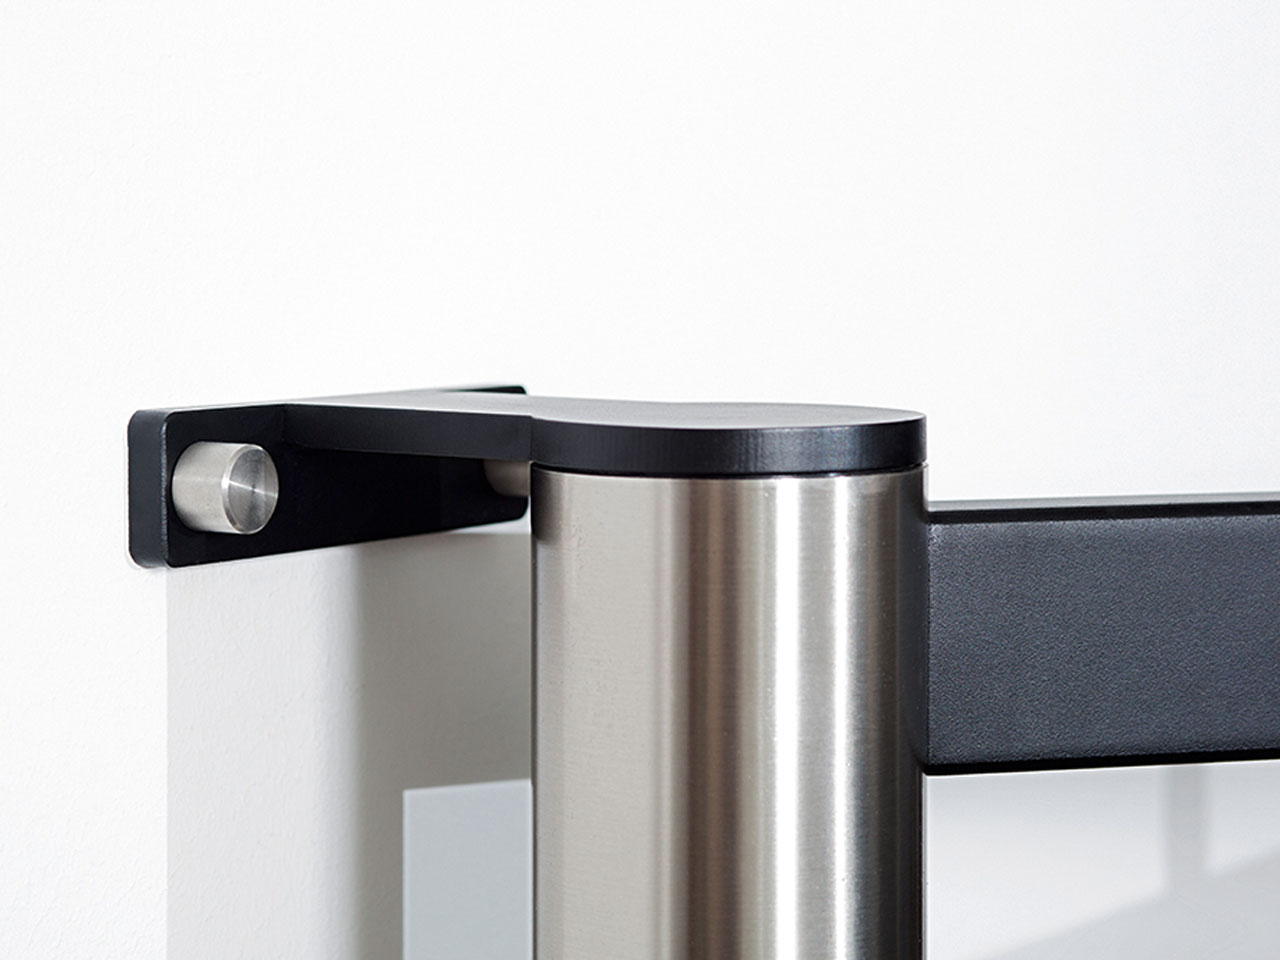 wissmann tv halter solution art112 g nstig kaufen cmb systeme. Black Bedroom Furniture Sets. Home Design Ideas